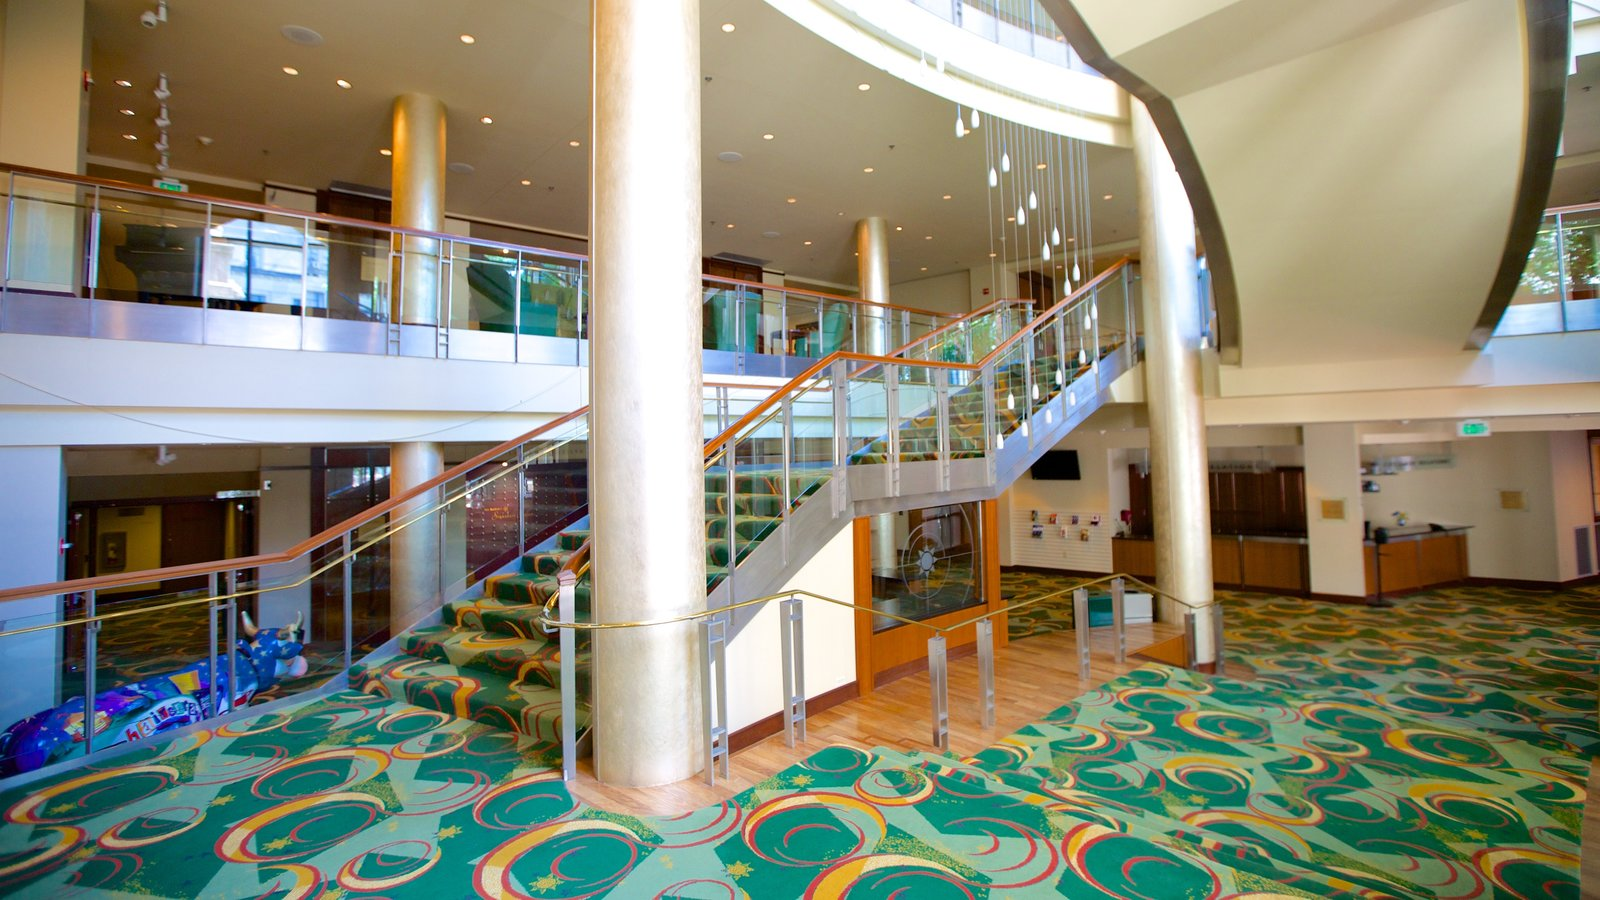 Bushnell Center for the Performing Arts mostrando vistas interiores